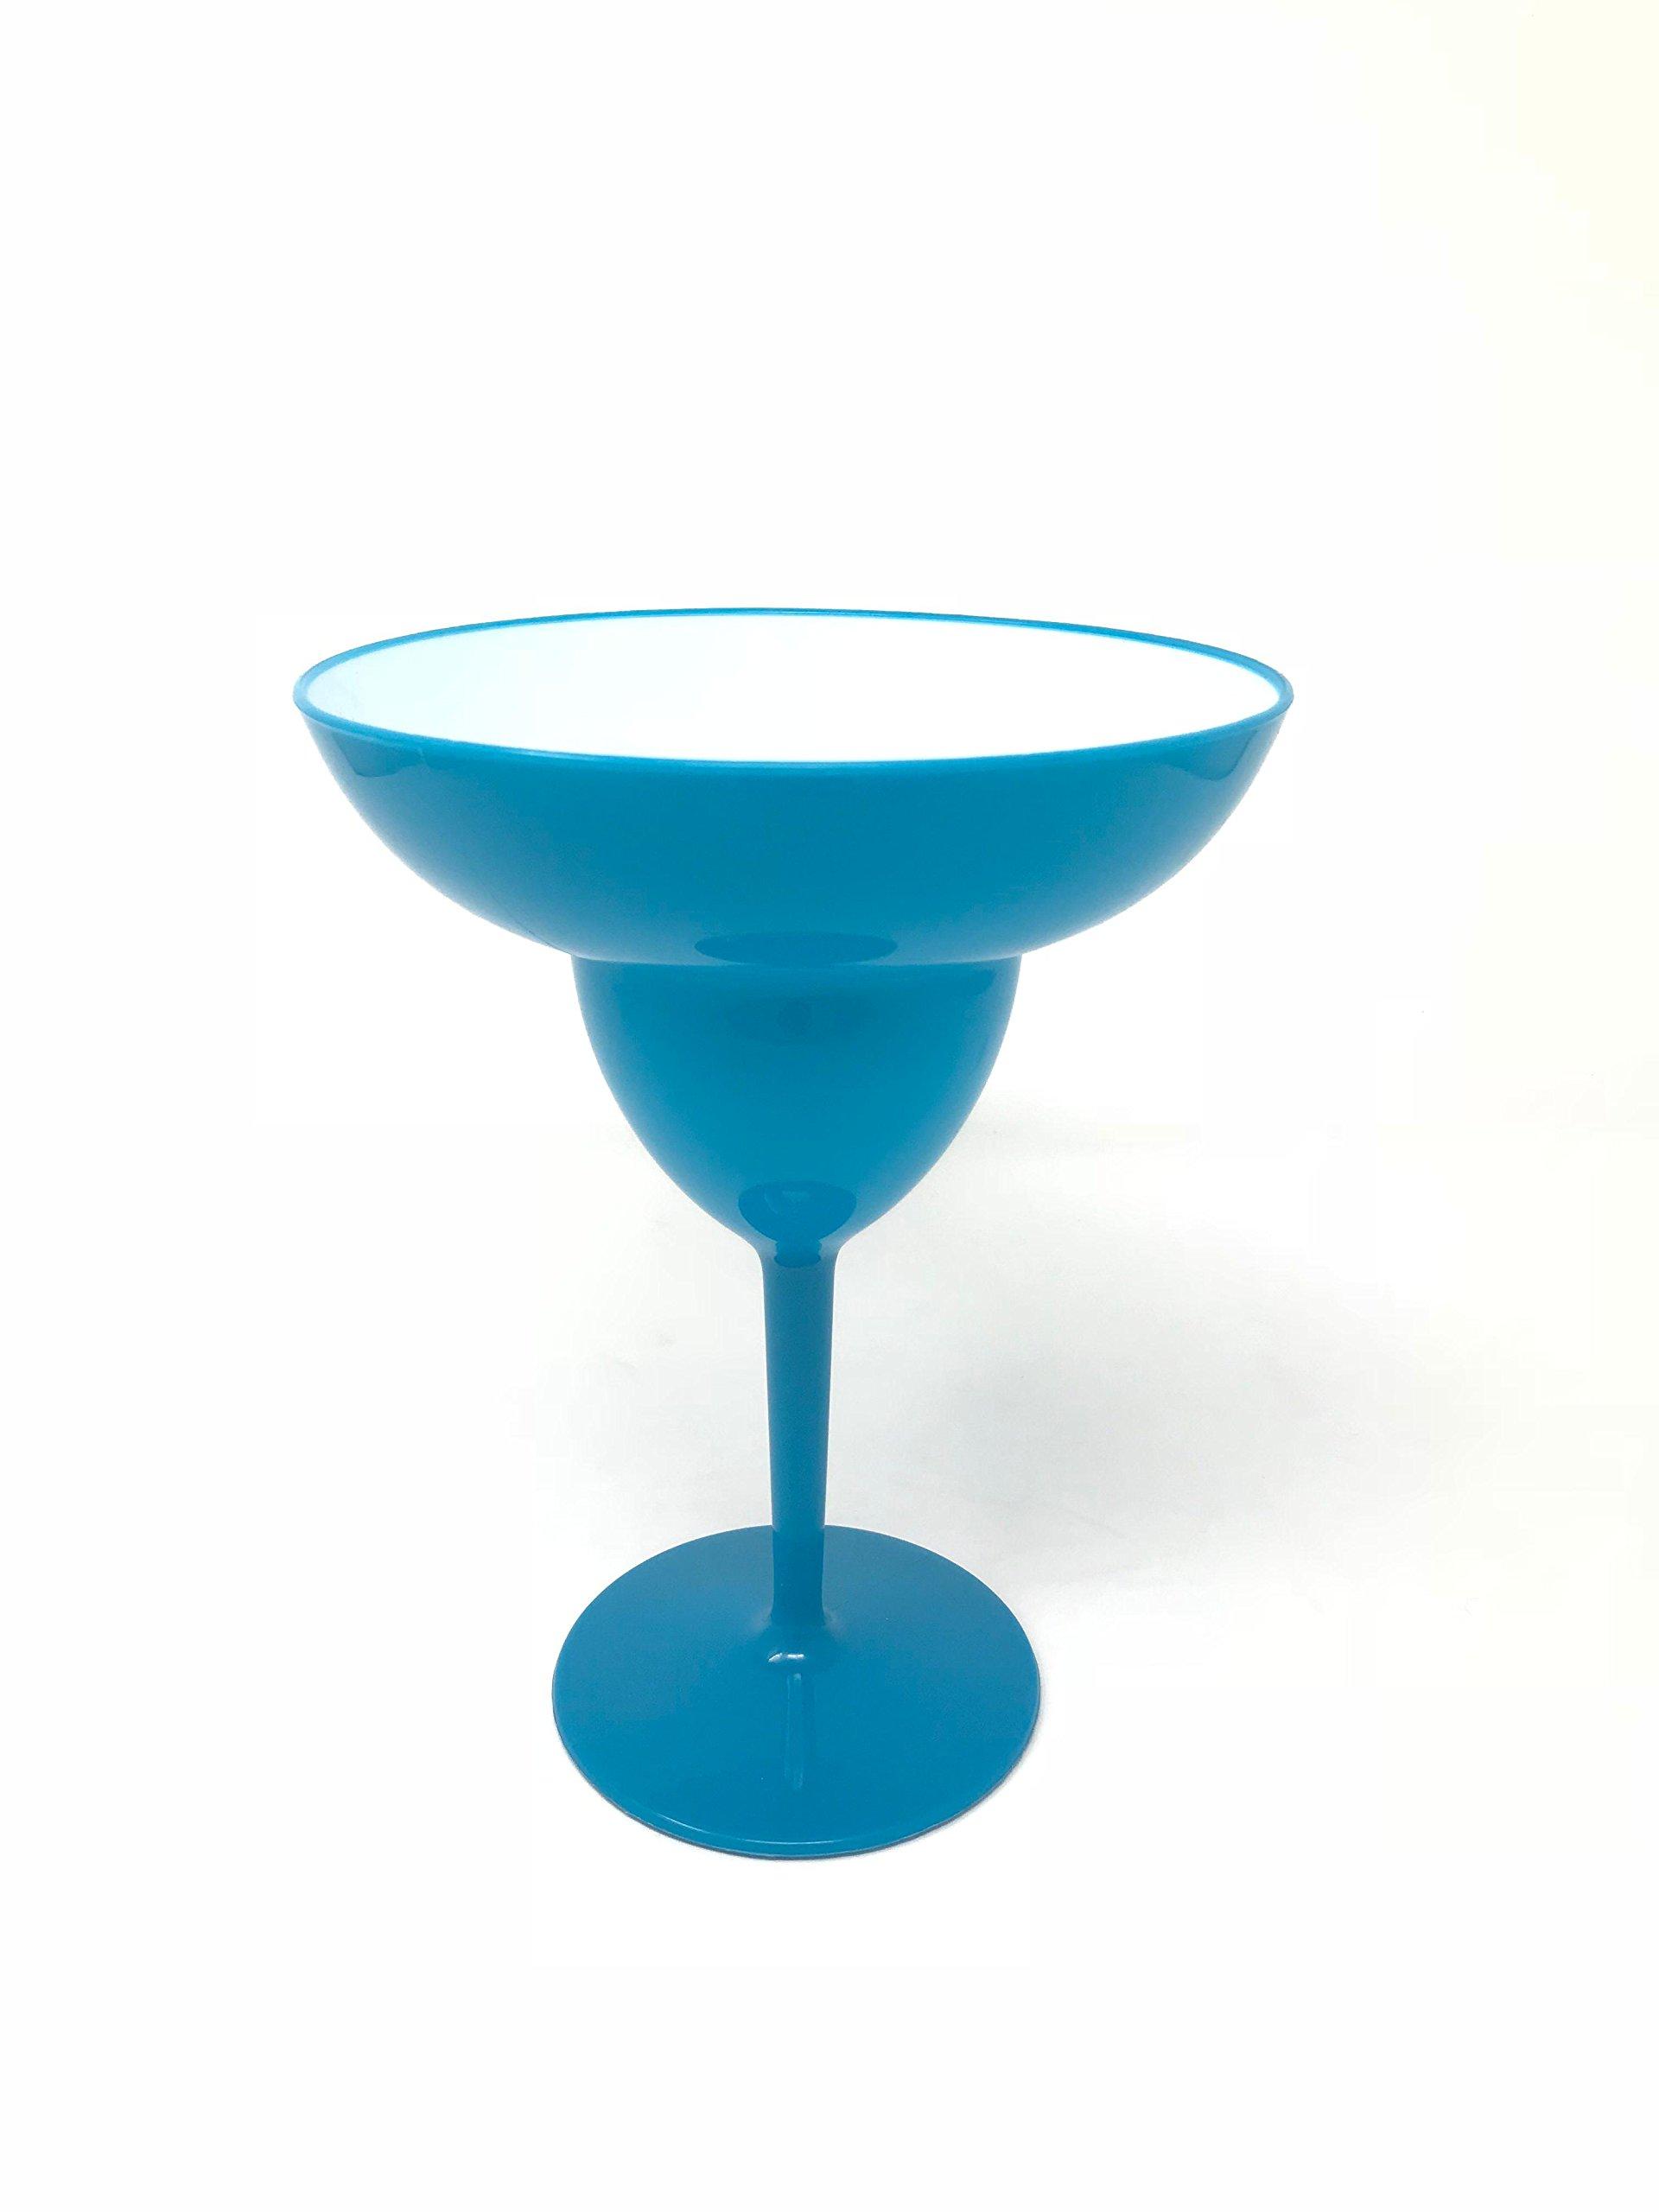 Plastic Giant Margarita Glass 6.5 x 8.5 Inches (Blue), Set of 4